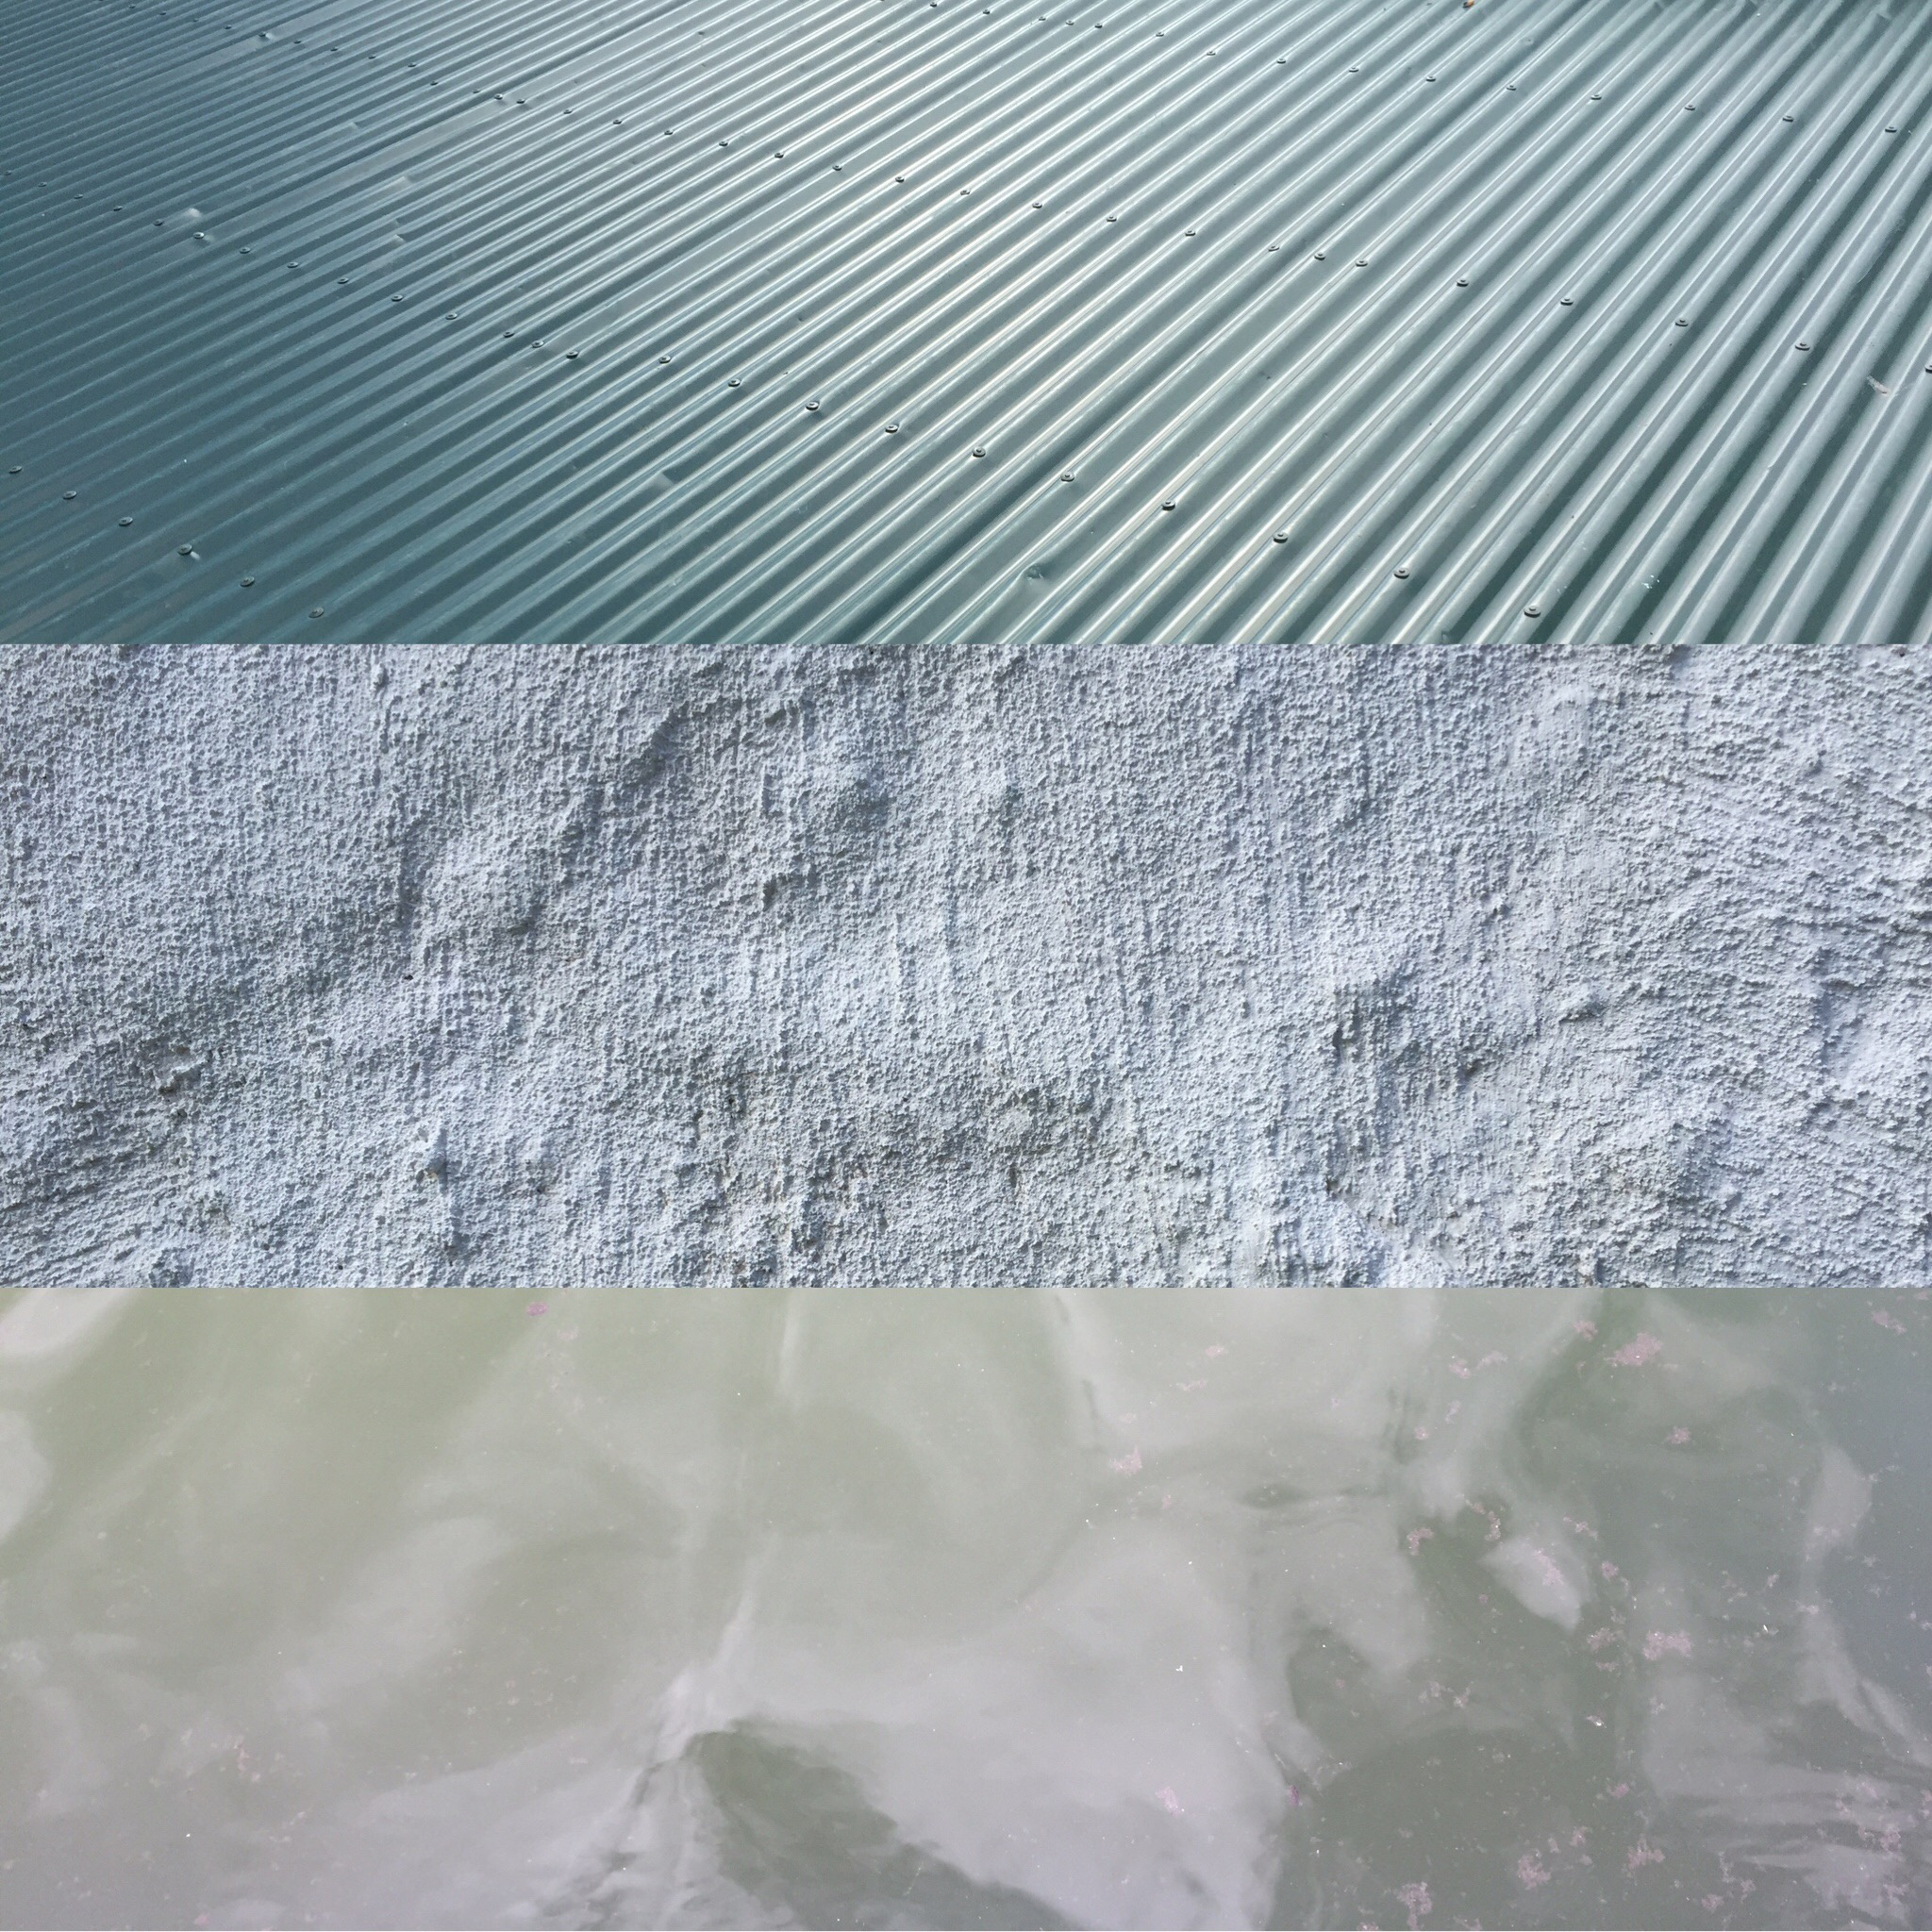 Copy of Seljavallalaug Pool